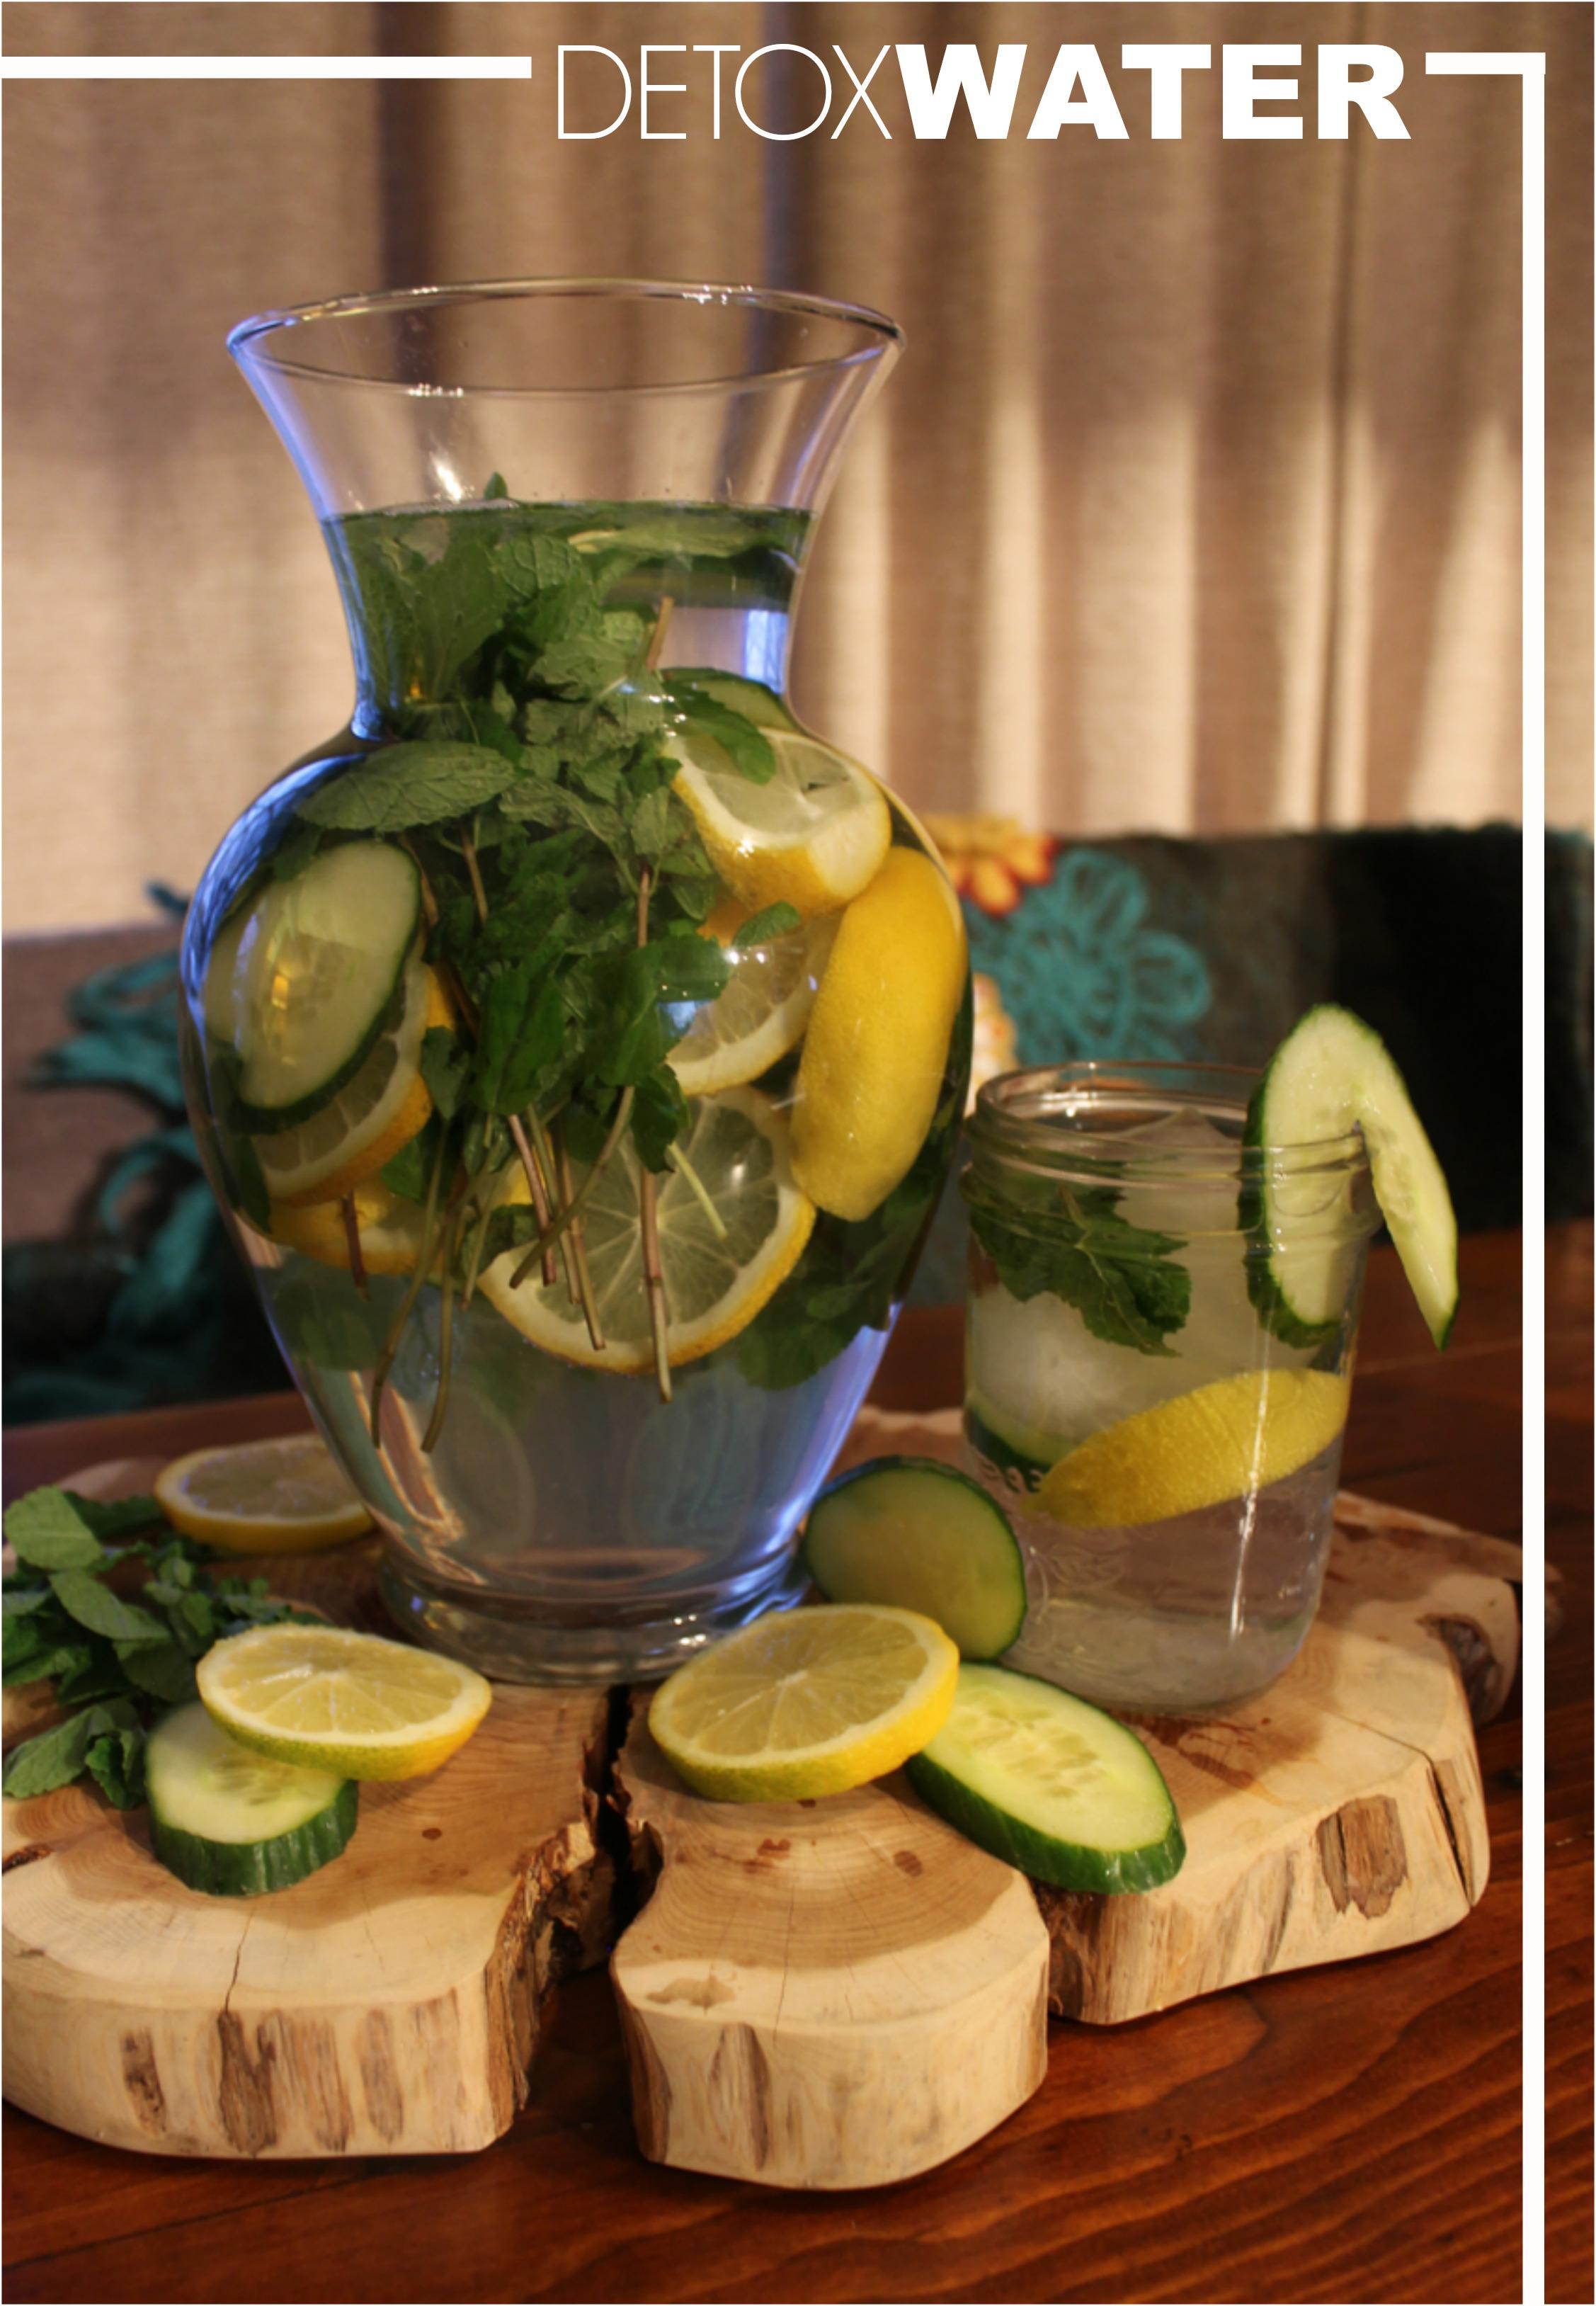 Detox Water You'll Love